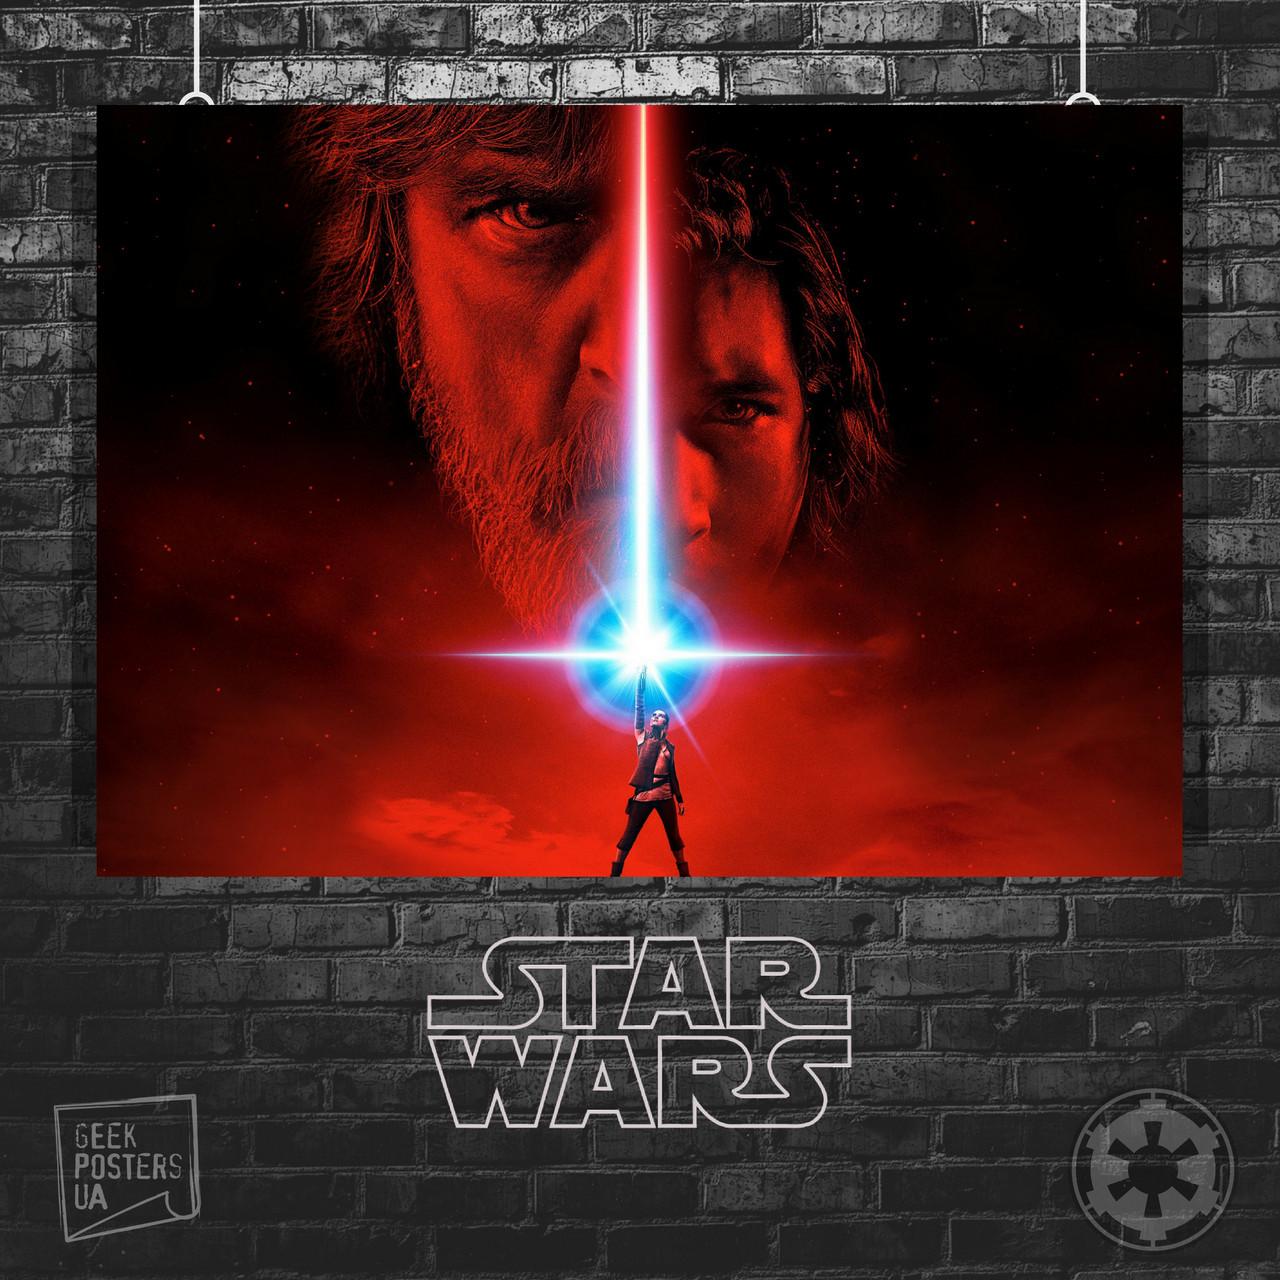 Постер Star Wars: Last Jedi (луч из руки вверх). Размер 60x42см (A2). Глянцевая бумага